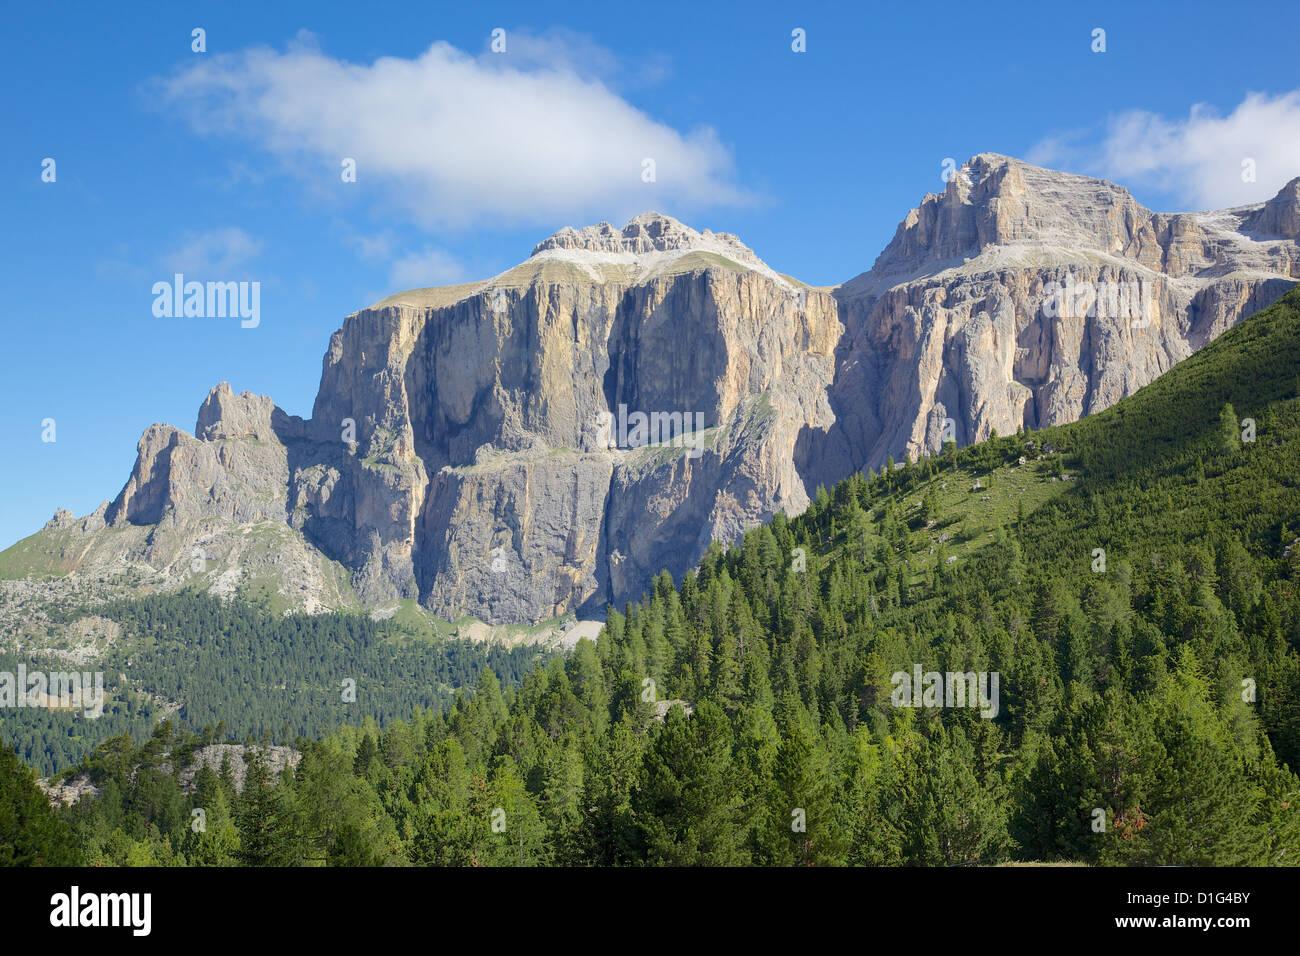 Pordoi Pass, Arabba, Belluno Province, Trento, Dolomites, Italy, Europe - Stock Image